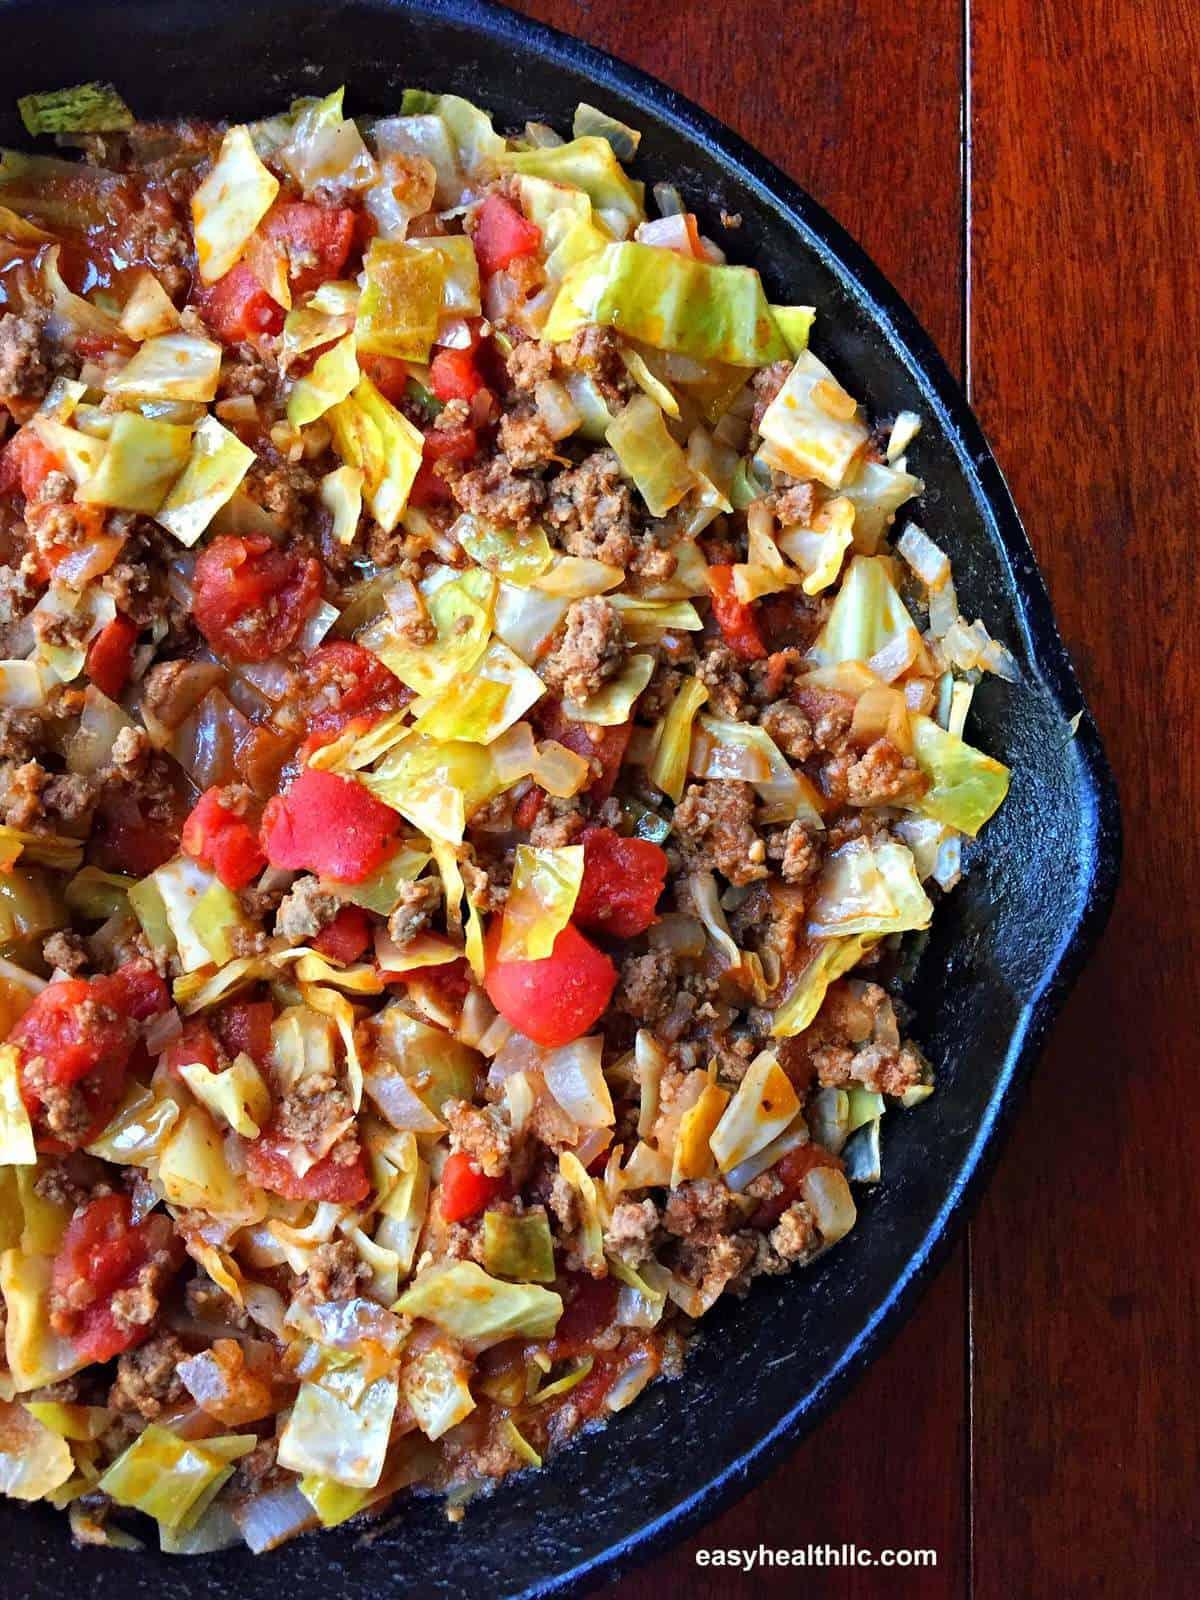 Easy Meal Recipes Dinner